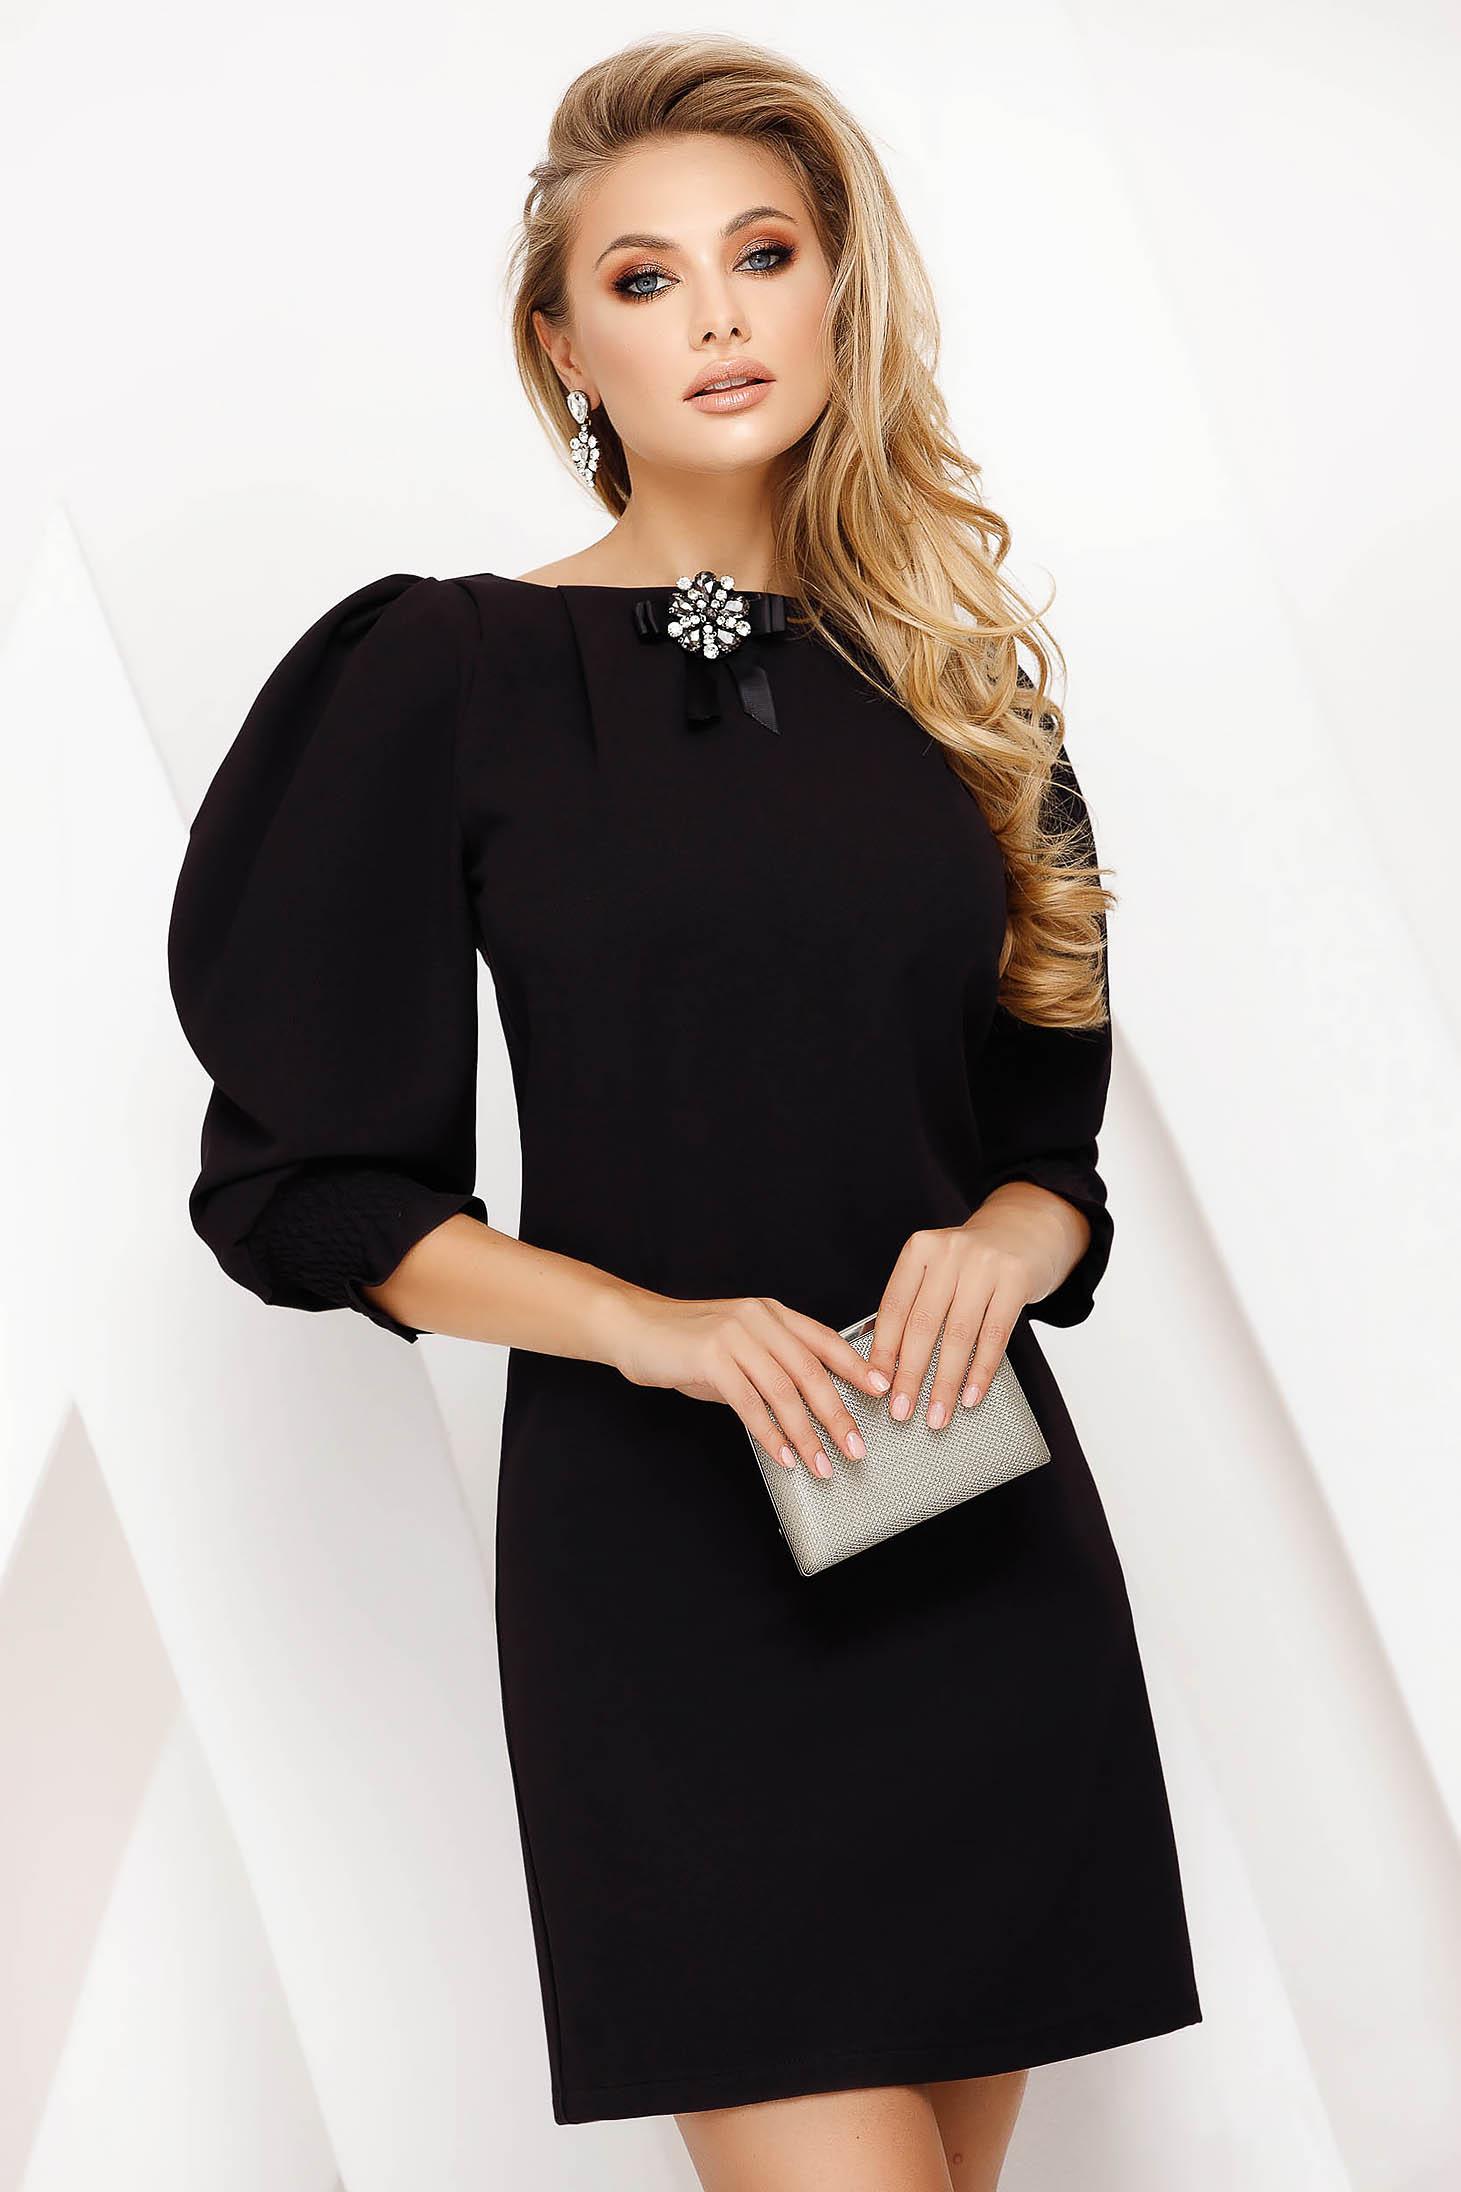 Rochie Fofy neagra scurta eleganta cu un croi drept din material subtire accesorizata cu brosa